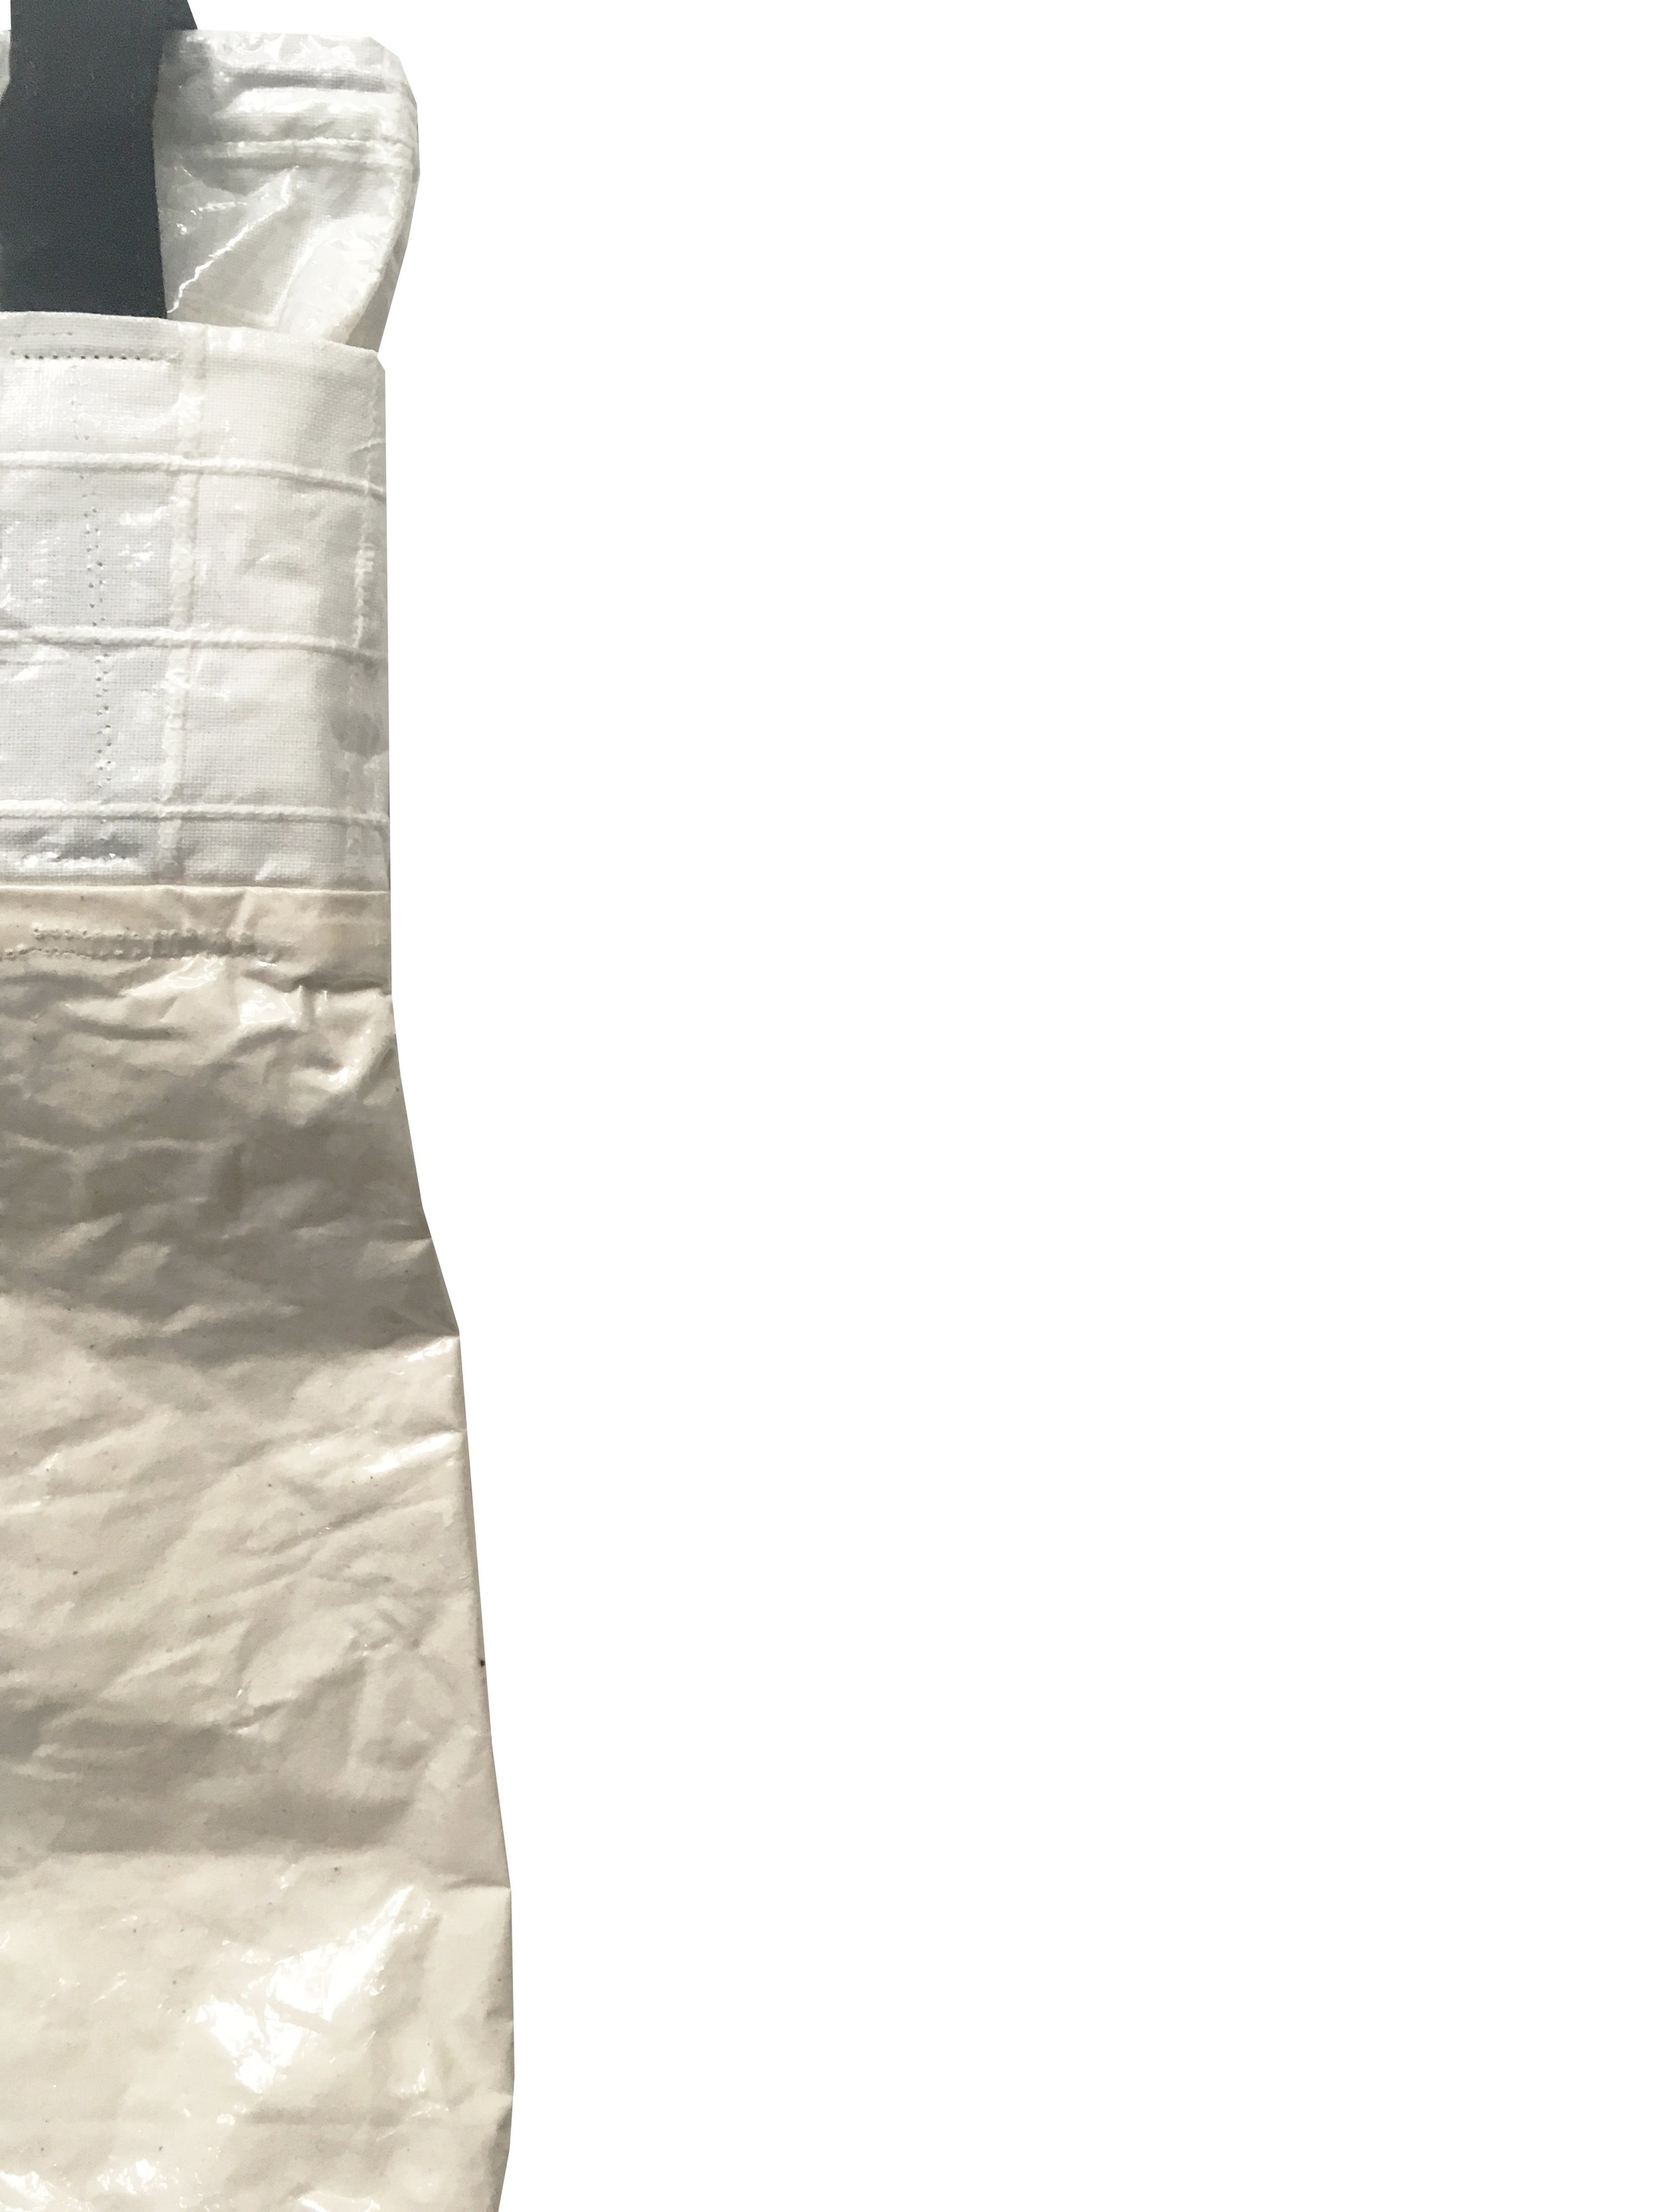 Backpack11(2).jpg